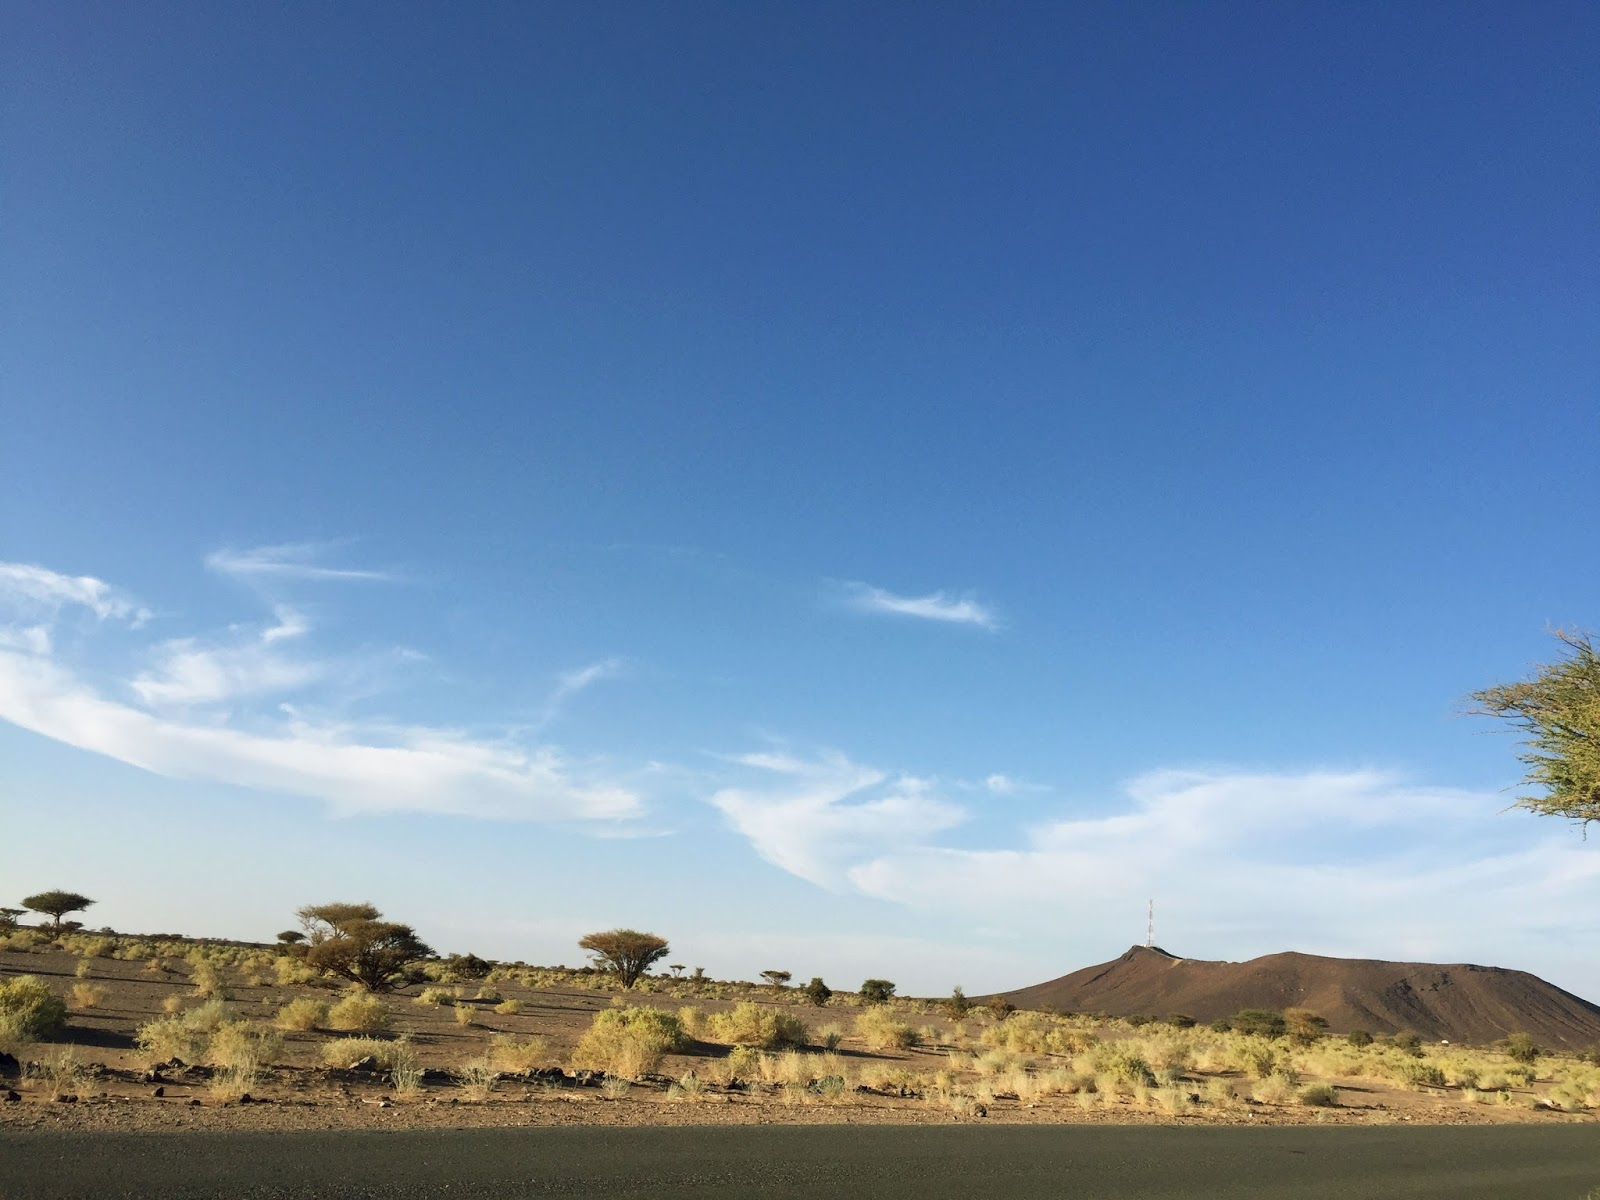 saudi arabia landscape, desert road